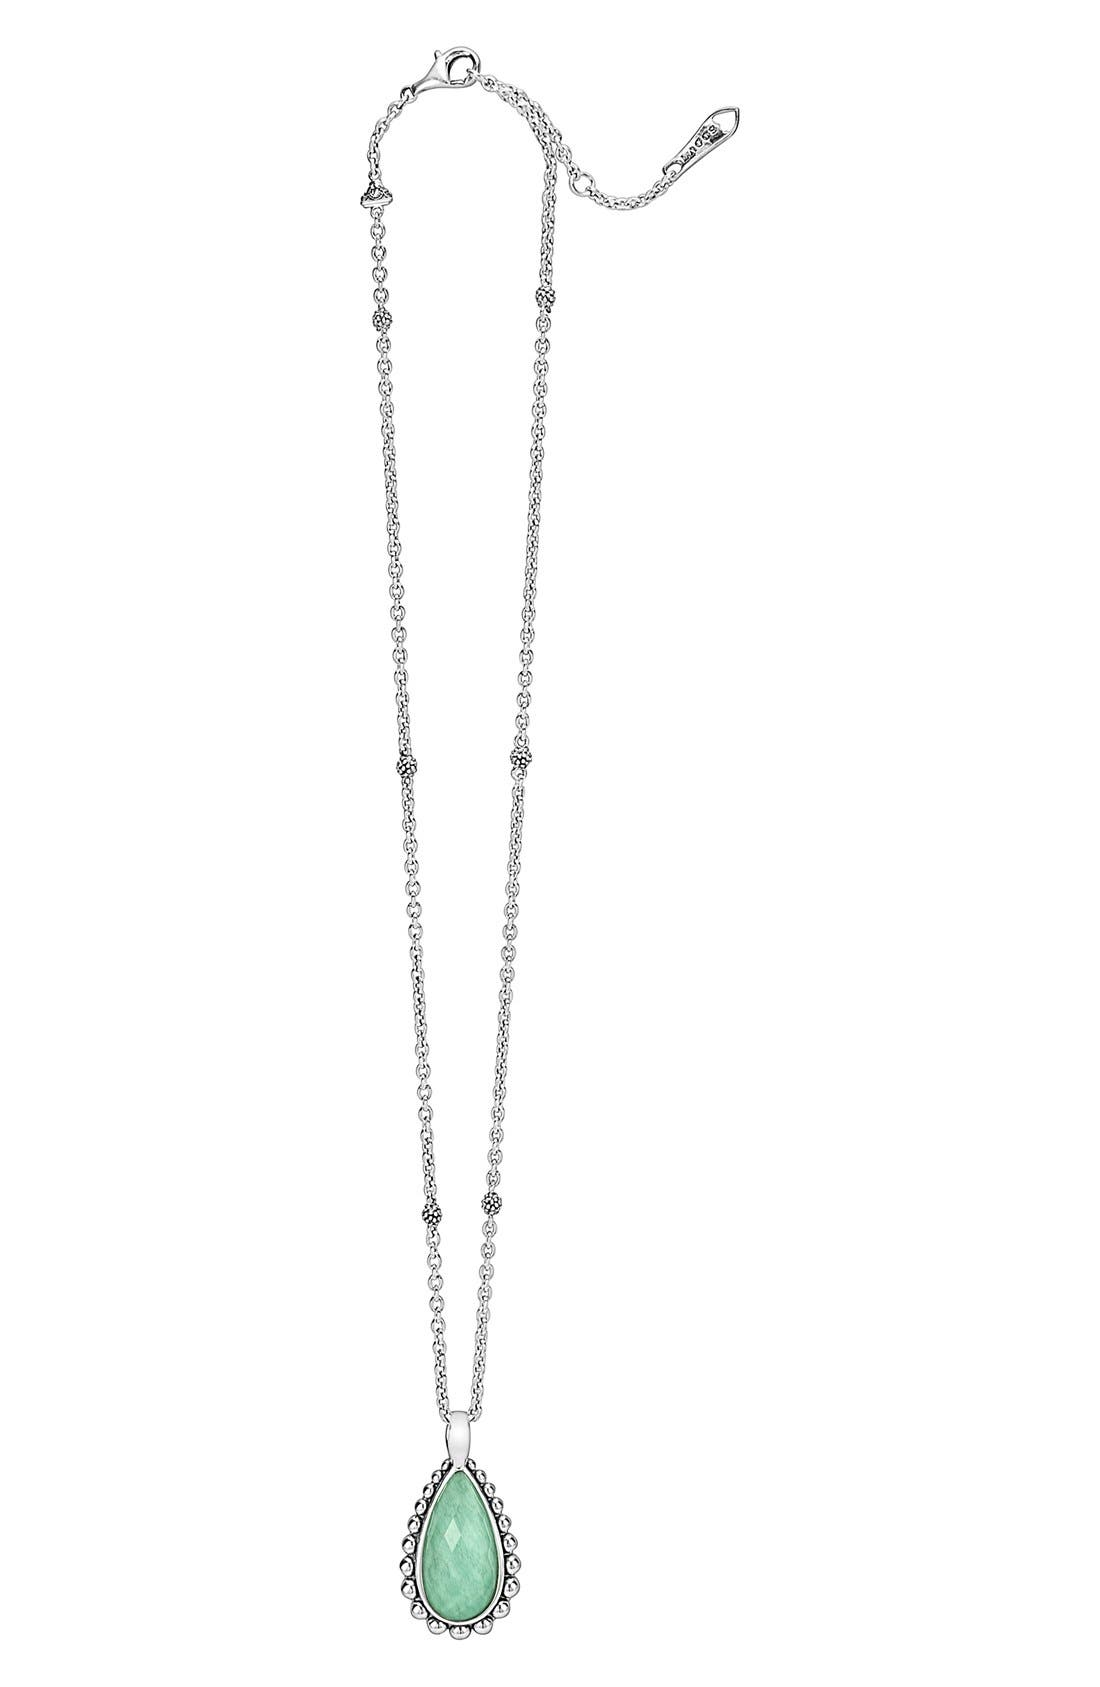 LAGOS 'Maya' Teardrop Pendant Necklace